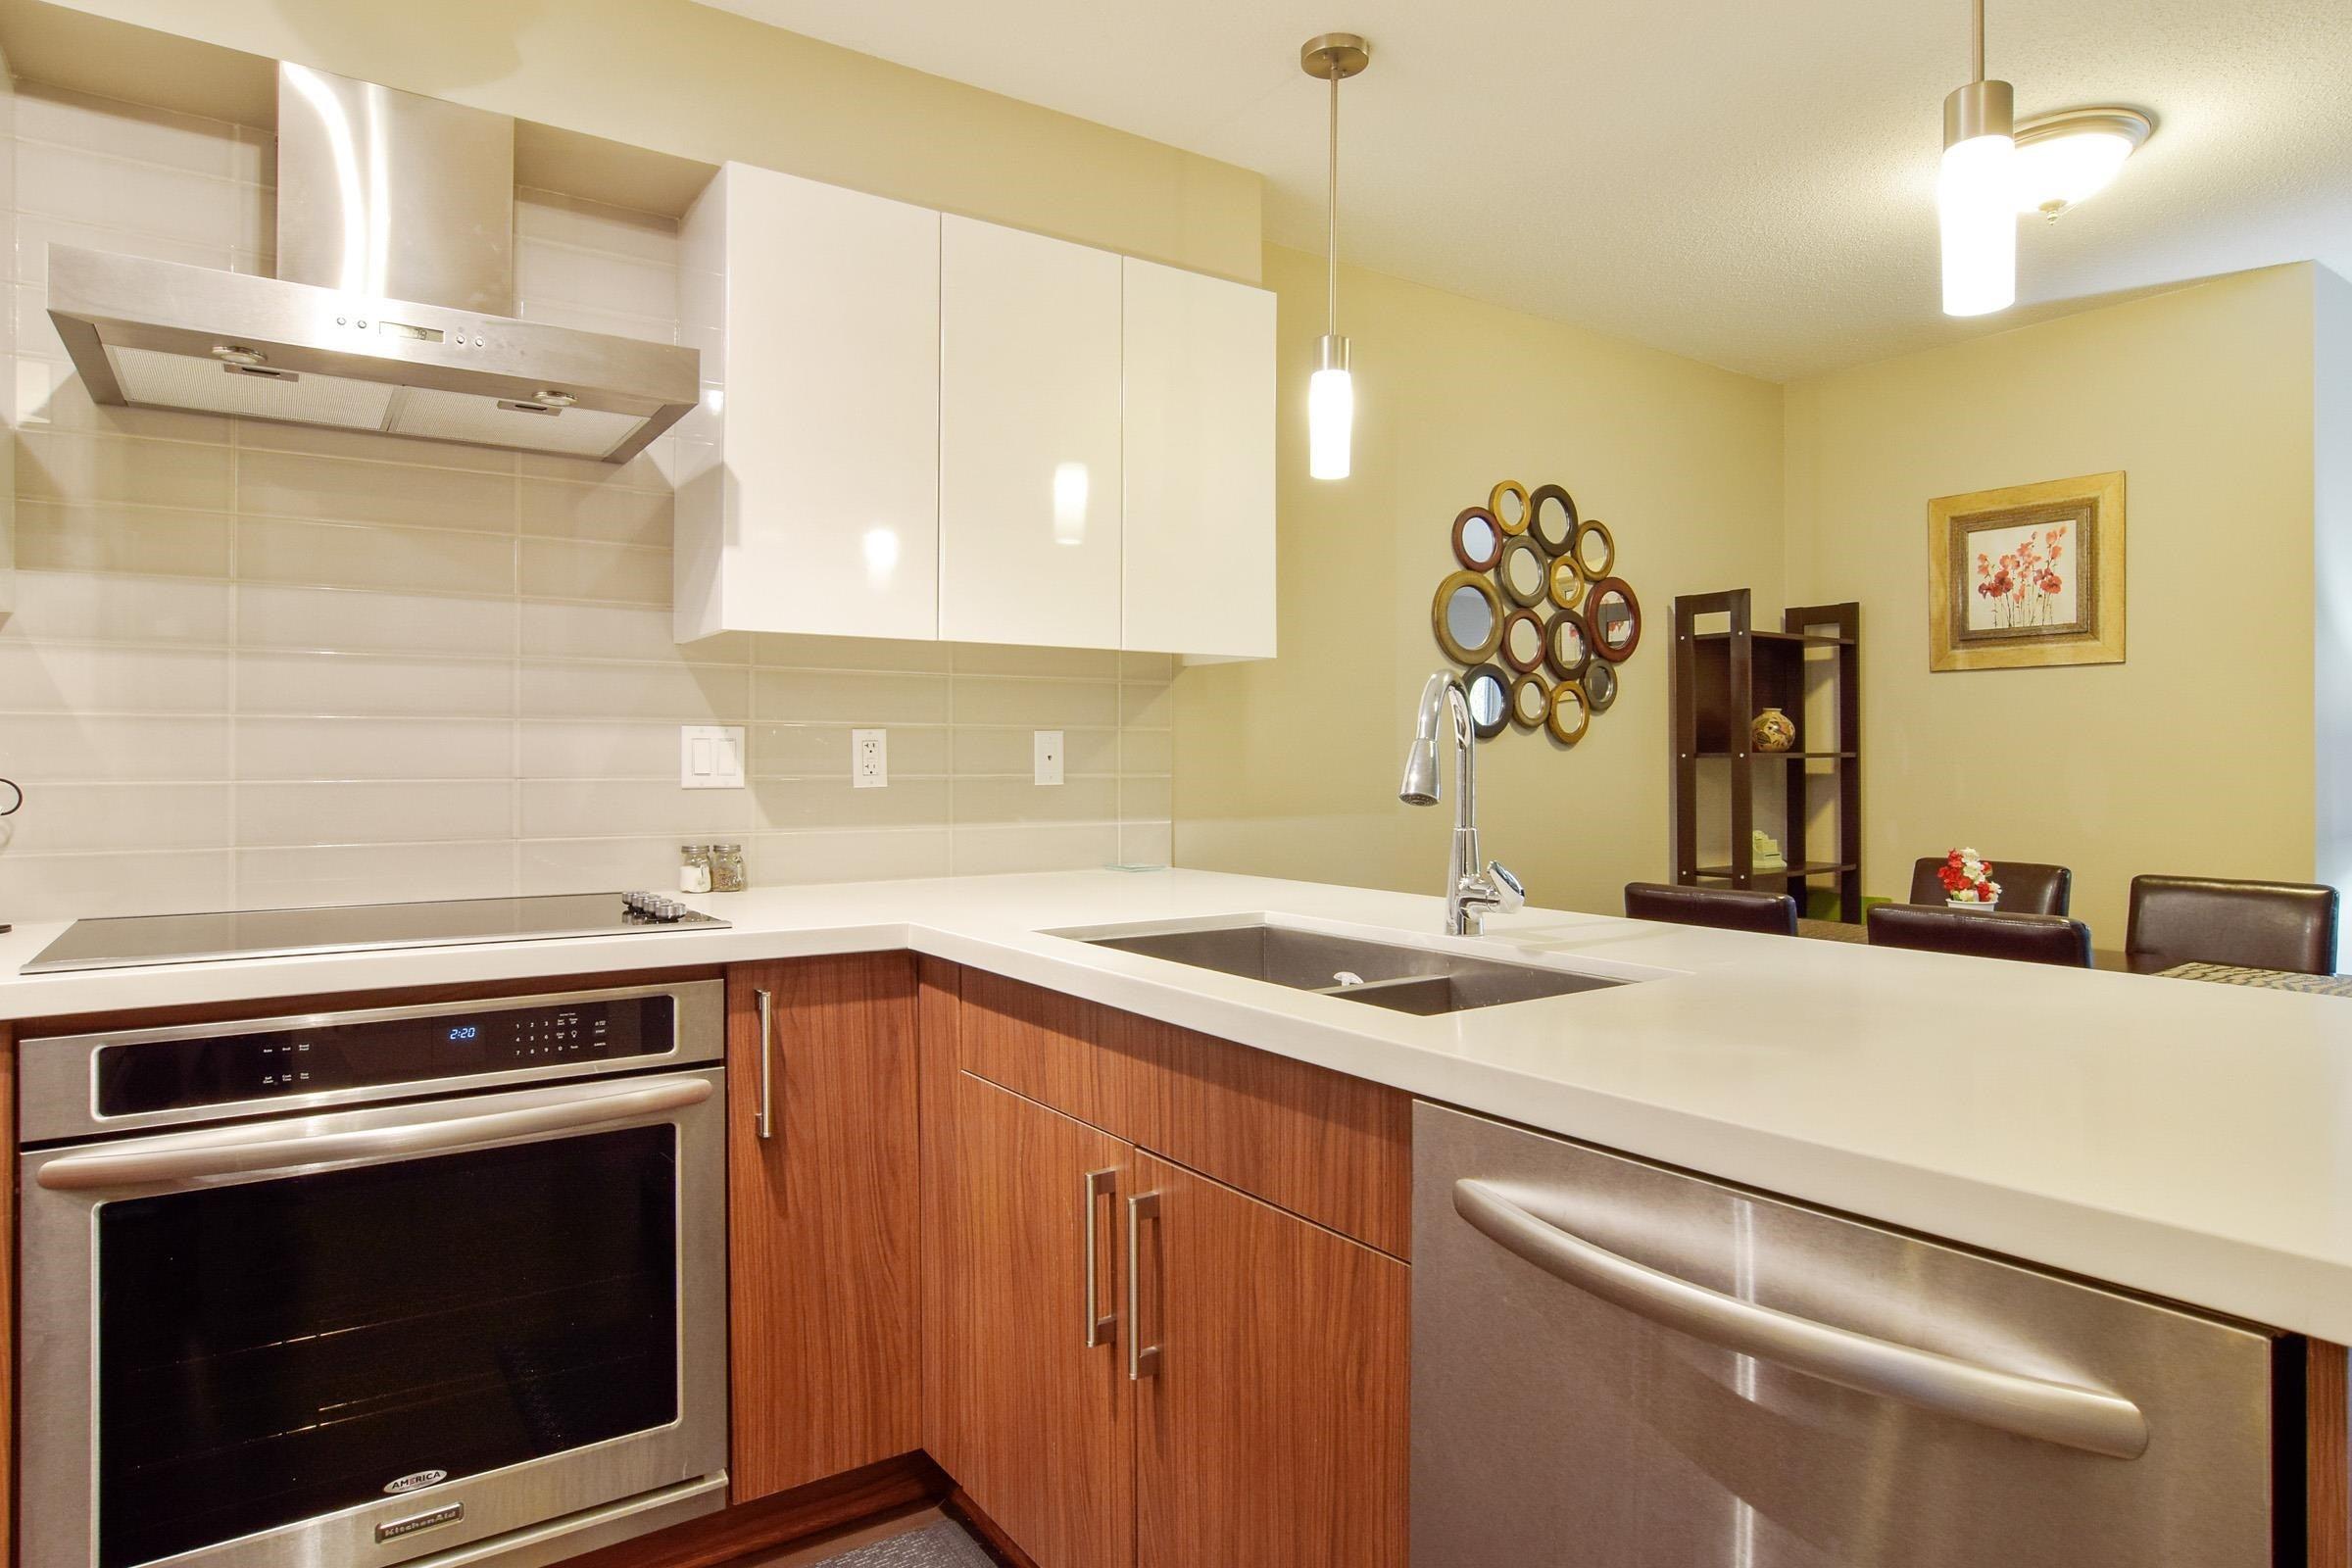 301 7131 STRIDE AVENUE - Edmonds BE Apartment/Condo for sale, 1 Bedroom (R2625669) - #8